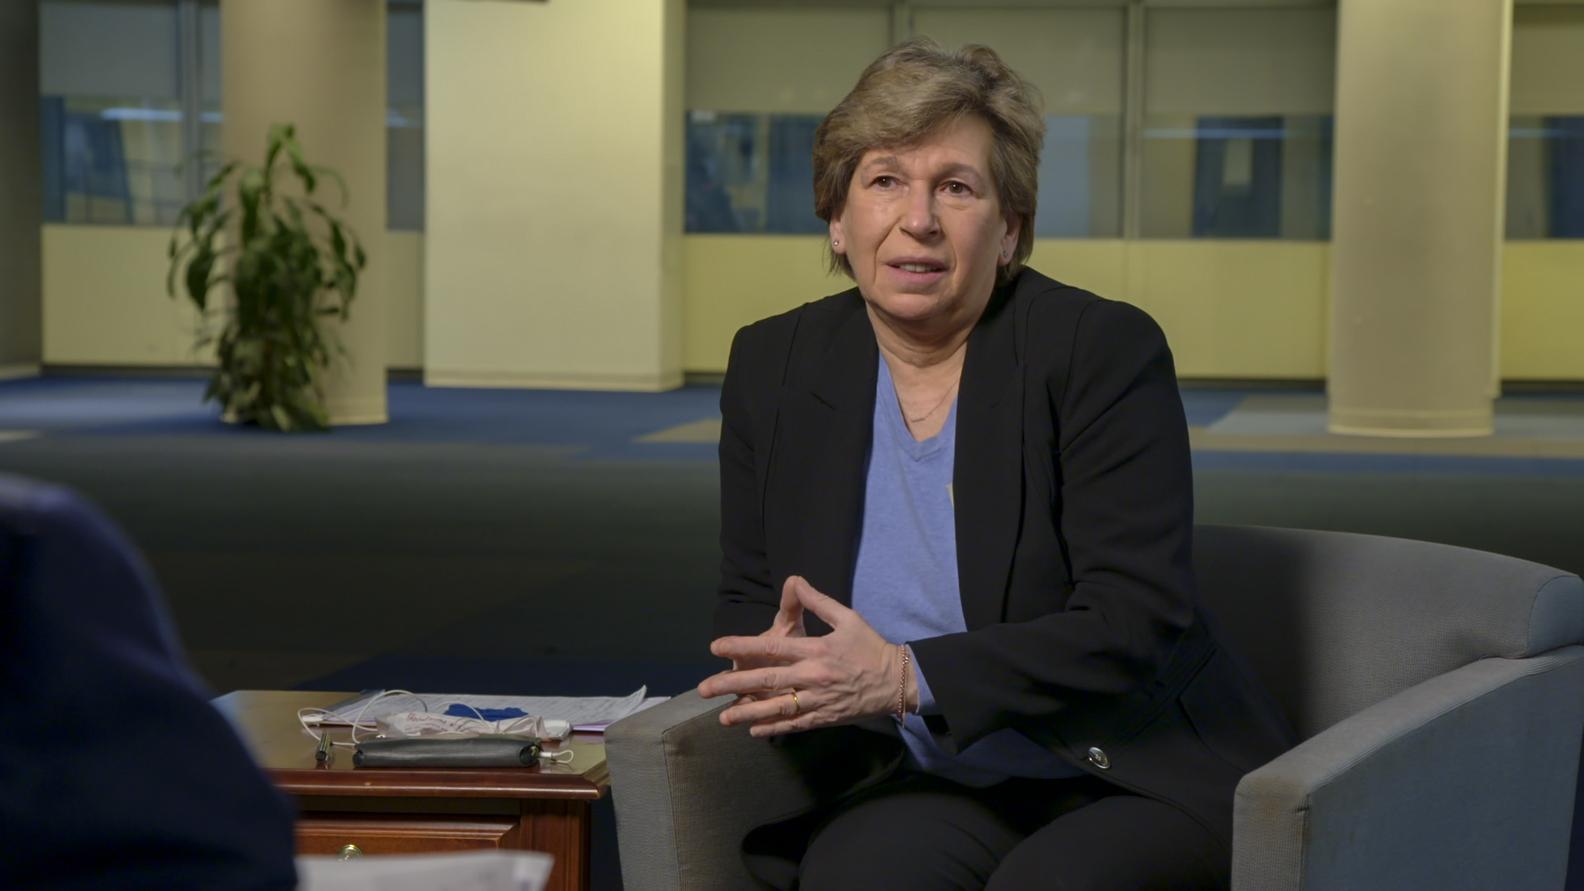 Randi Weingarten, President, American Federation of Teachers